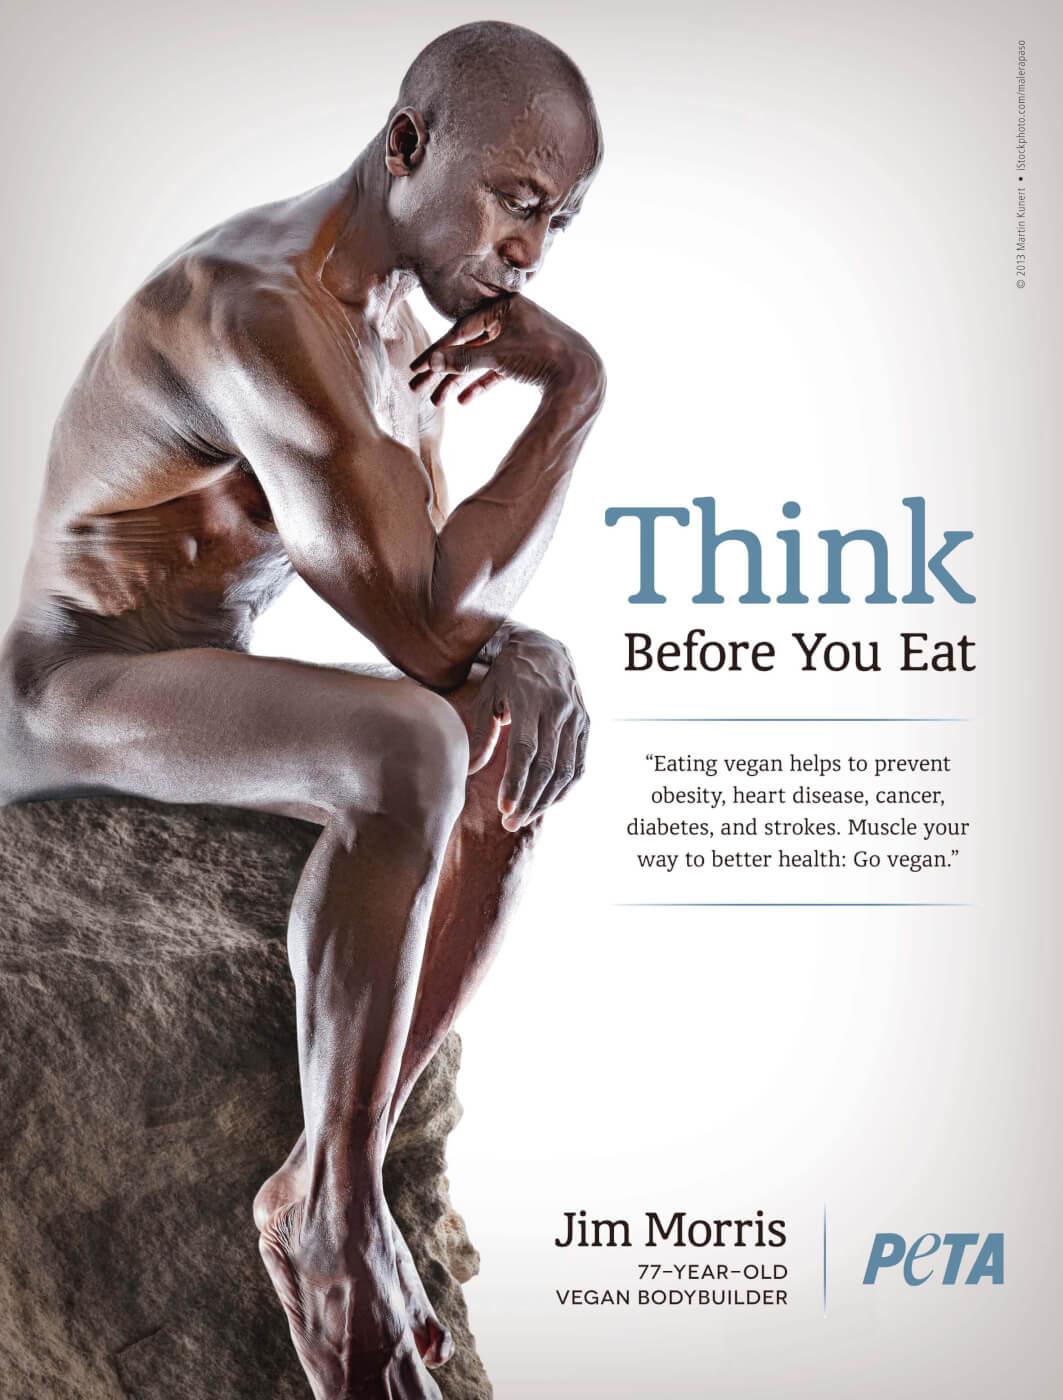 Jim Morriss Vegan Bodybuilder 78 years old